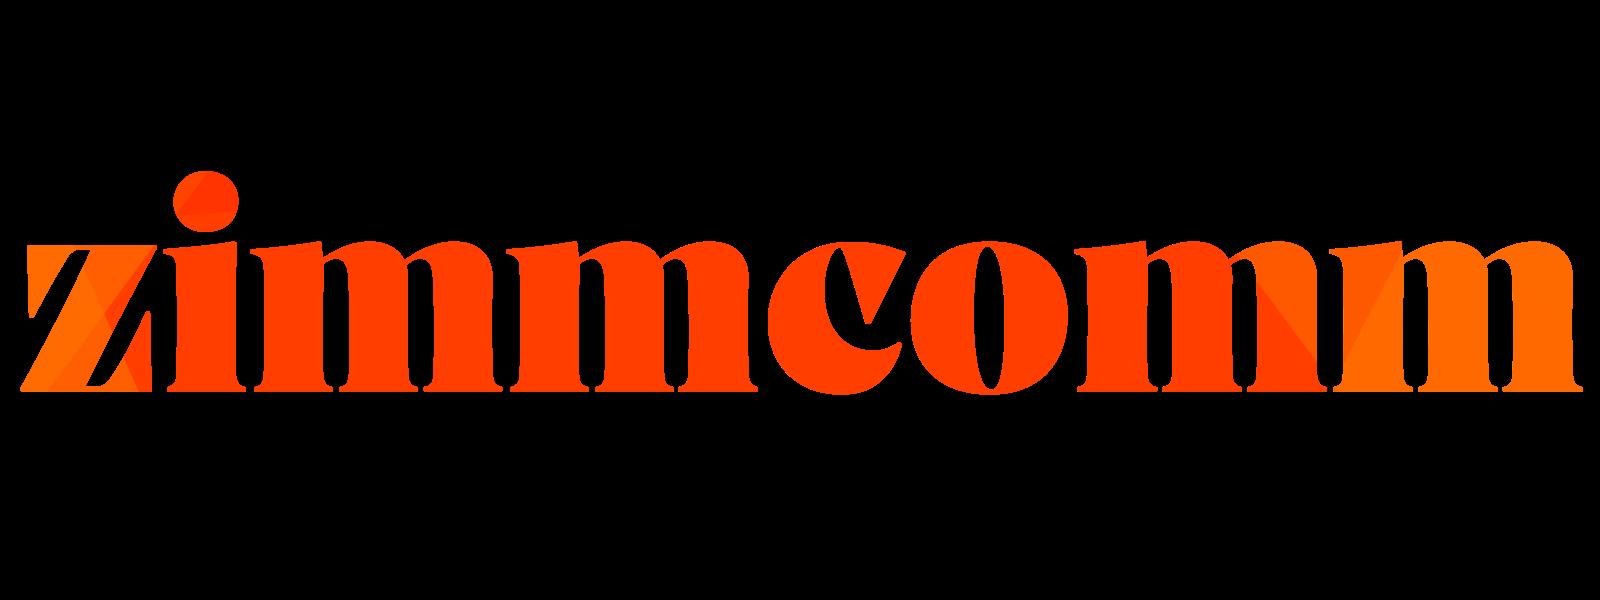 zimmcomm logo